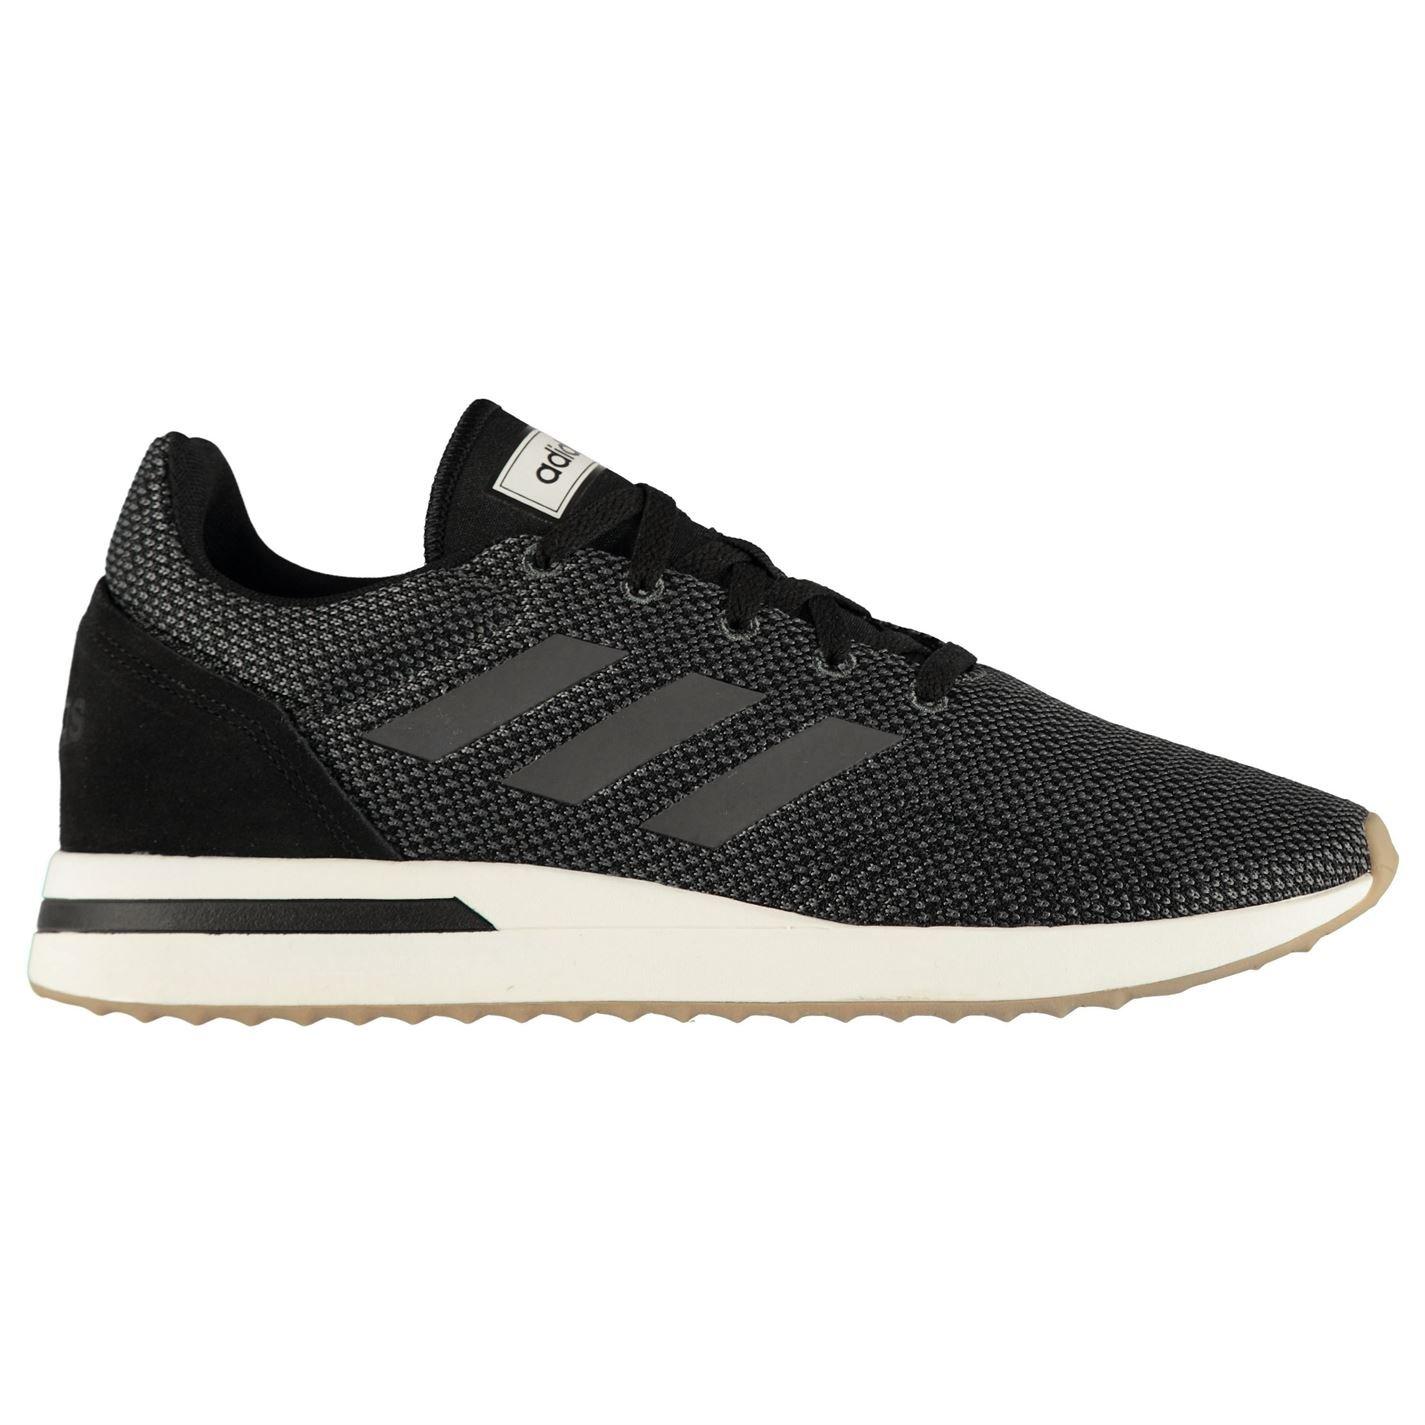 Adidas Run70s, Zapatillas de Entrenamiento para Hombre 46 EU|Negro